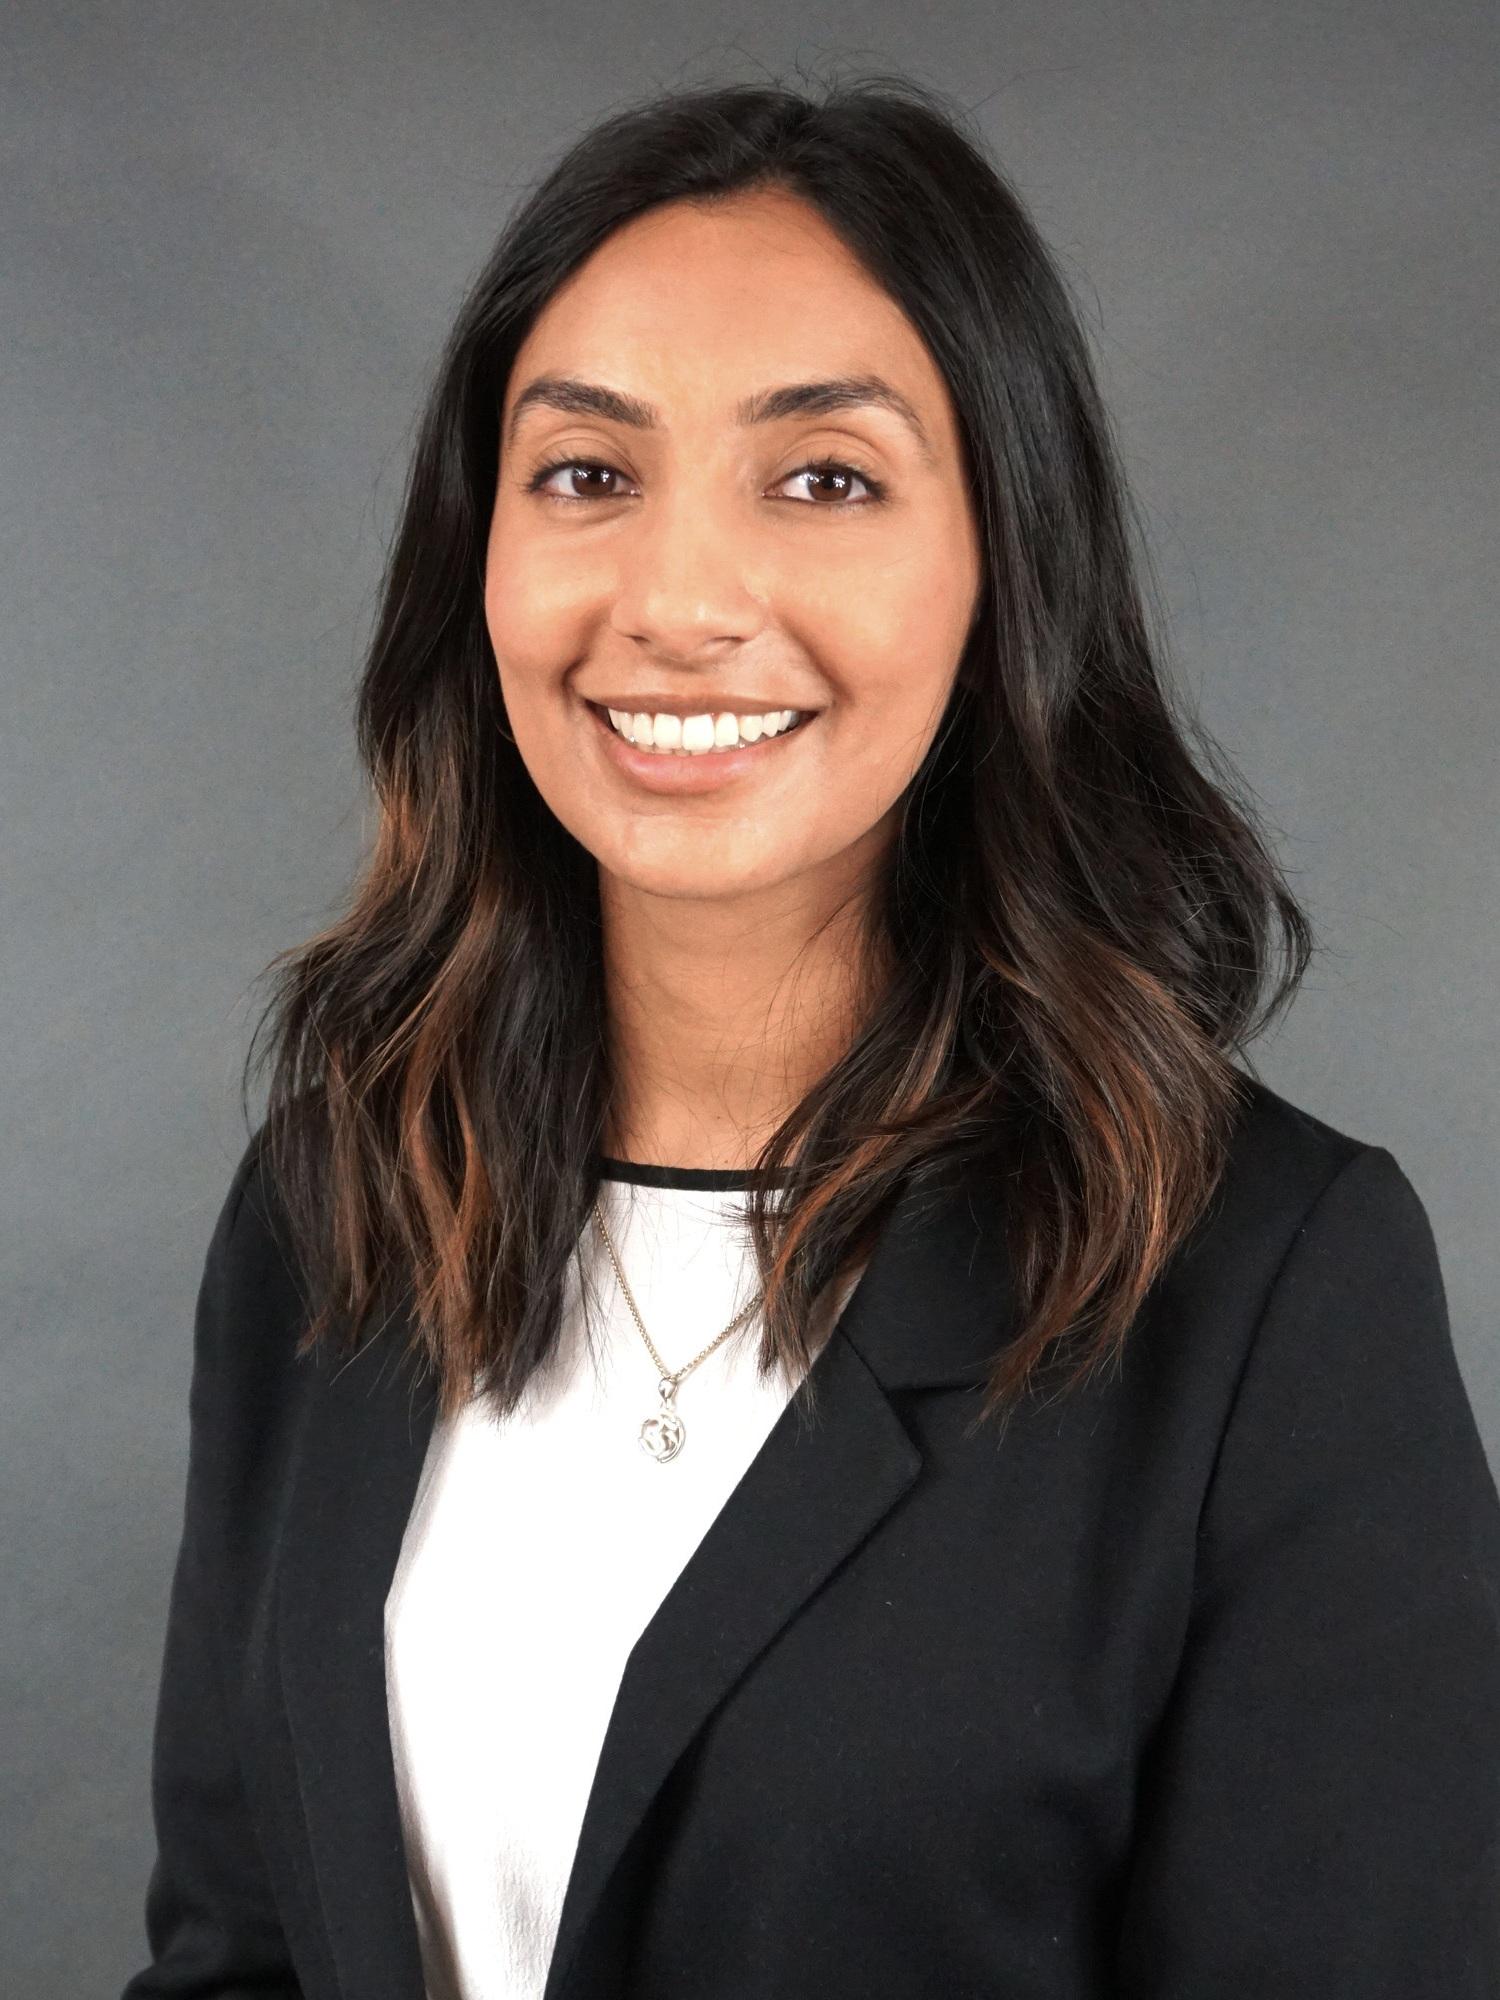 Natasha Doshi, MPH - Quality Improvement Consultant, Long Beach